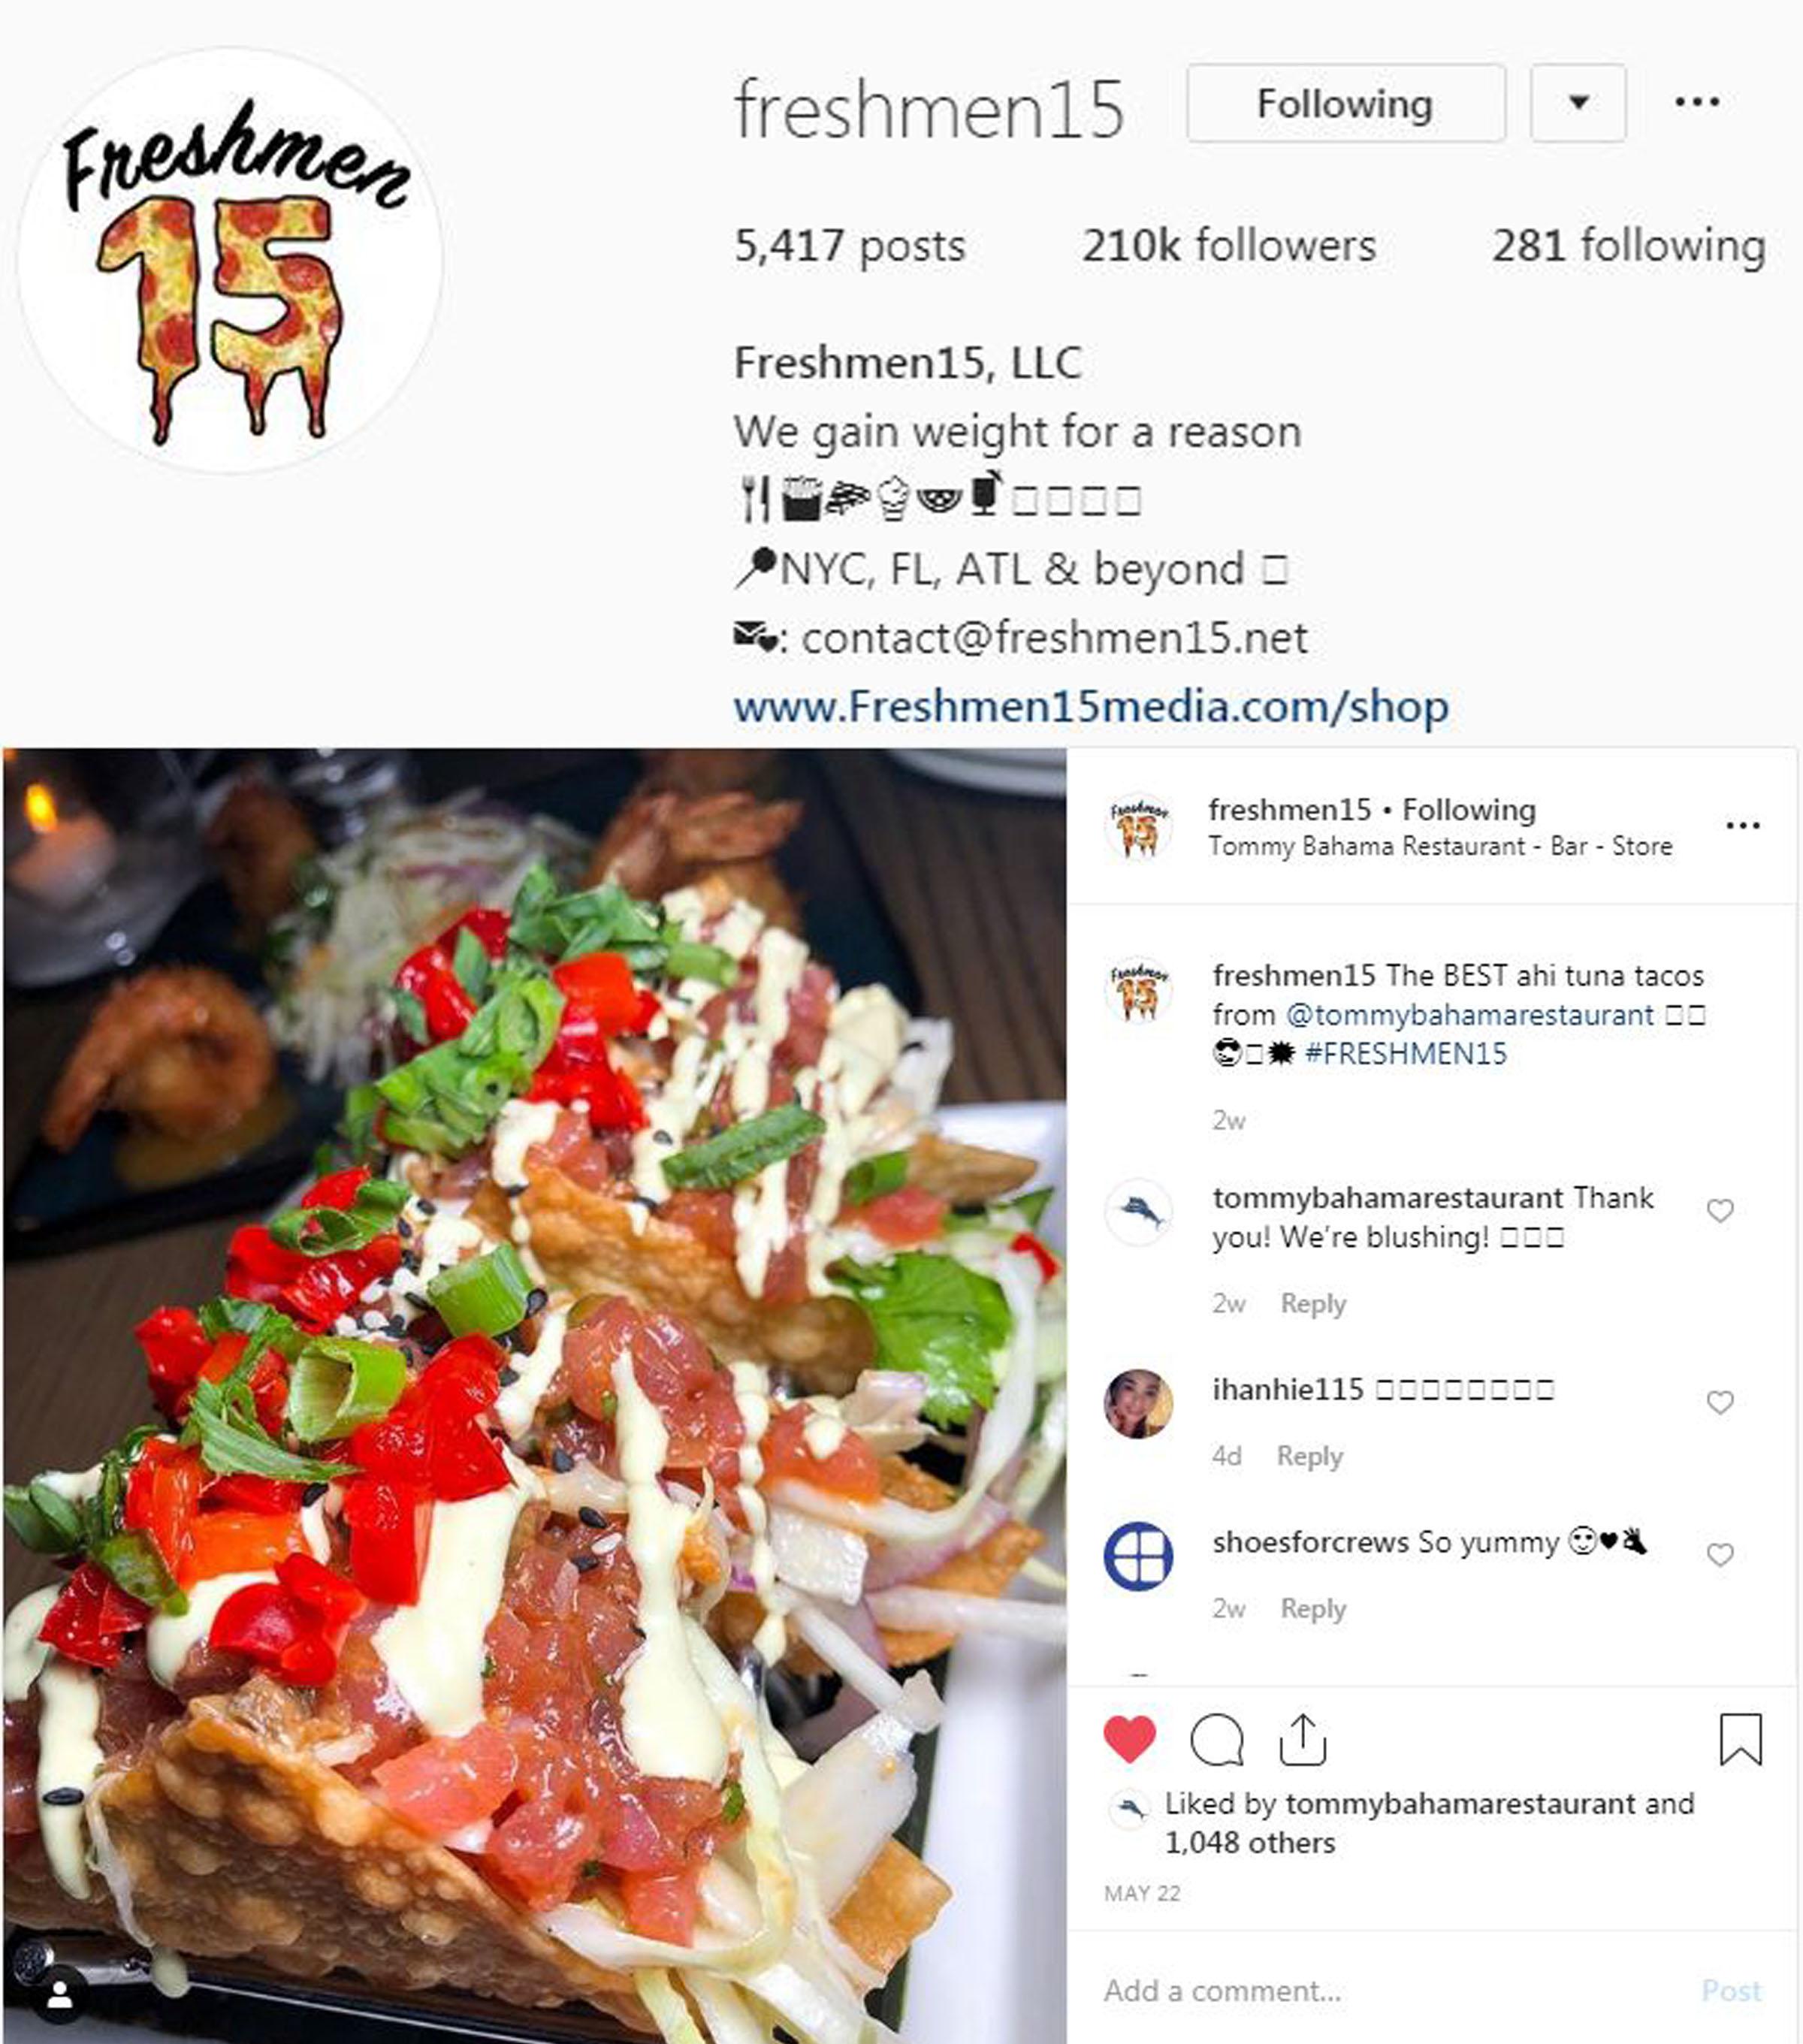 Freshmen15 Instagram - May 15 - TB NYC D